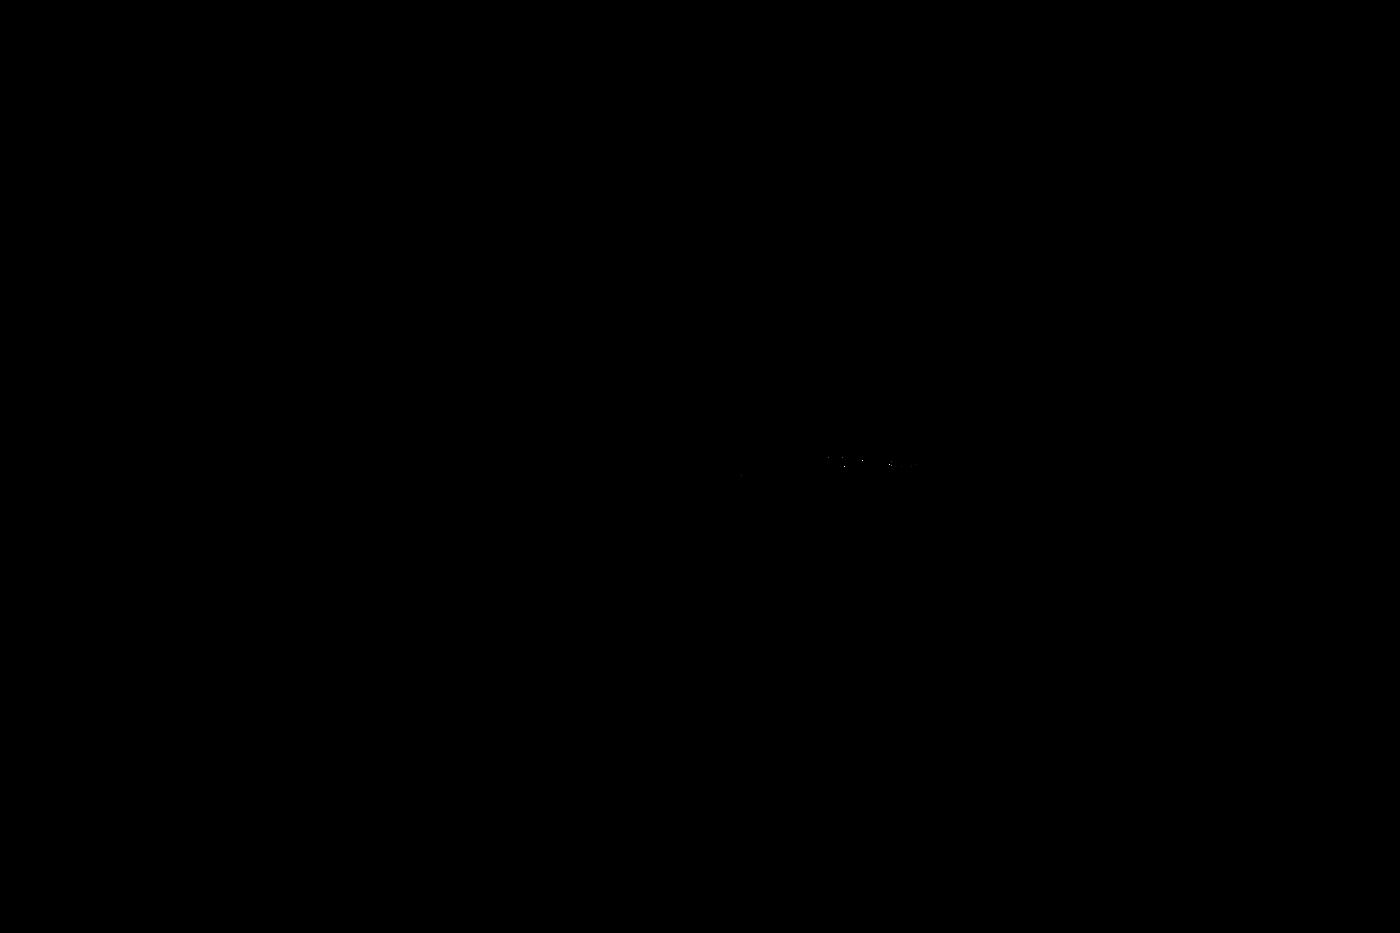 radmirvolk mark creative Icon sign logos logo collection brand identity logo